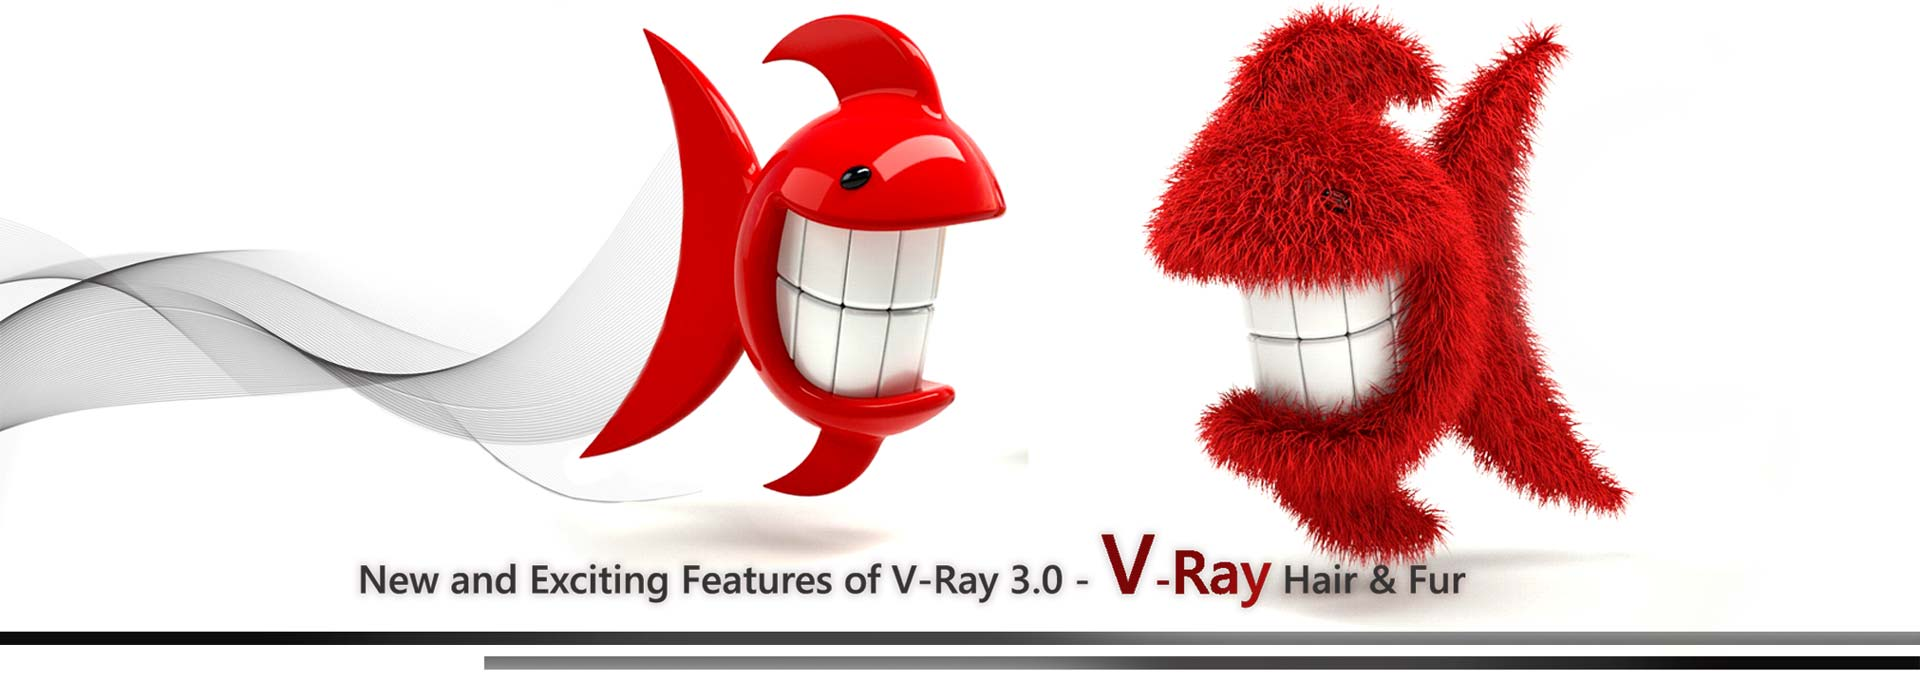 V Ray Hair Fur 3 - آموزش ساخت متریال مو و خز در وی ری